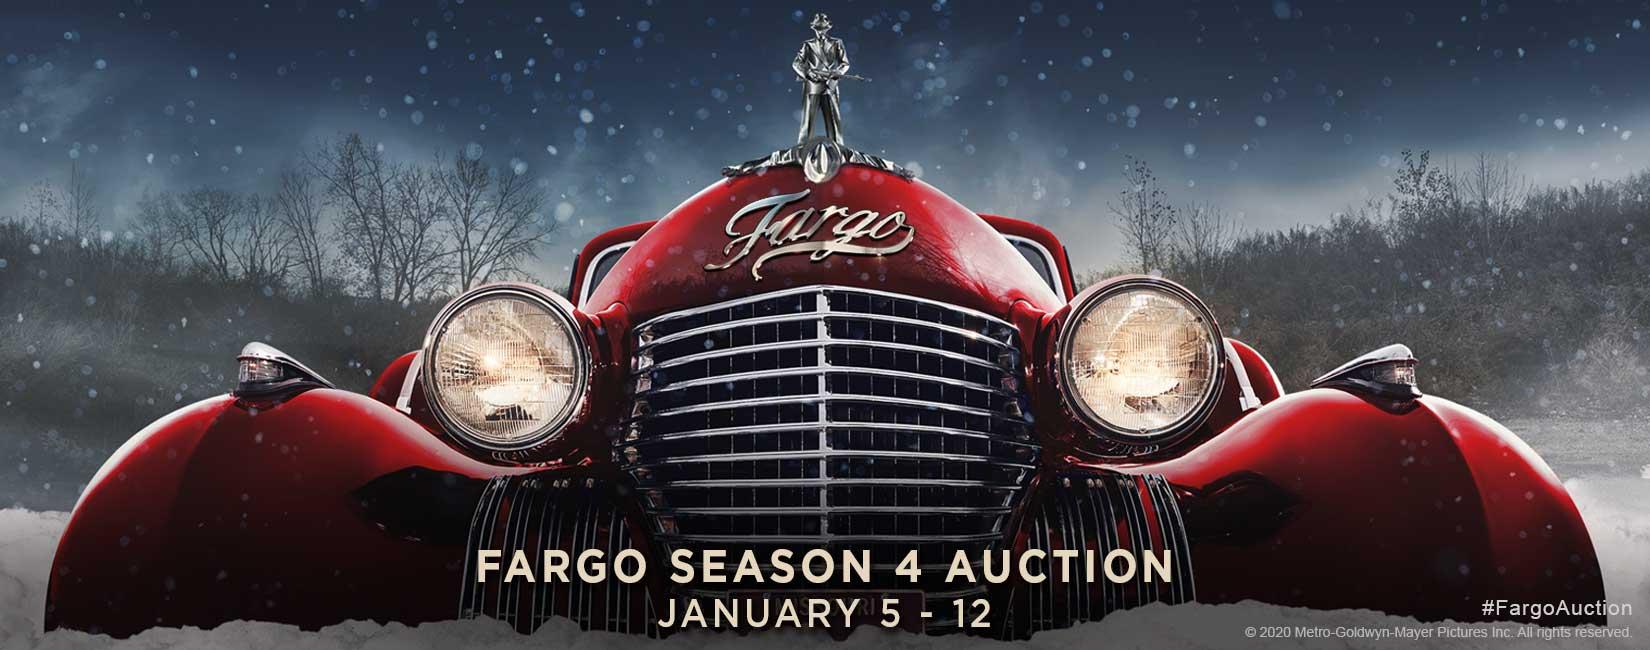 Fargo Season 4 Auction - January 5 - 12